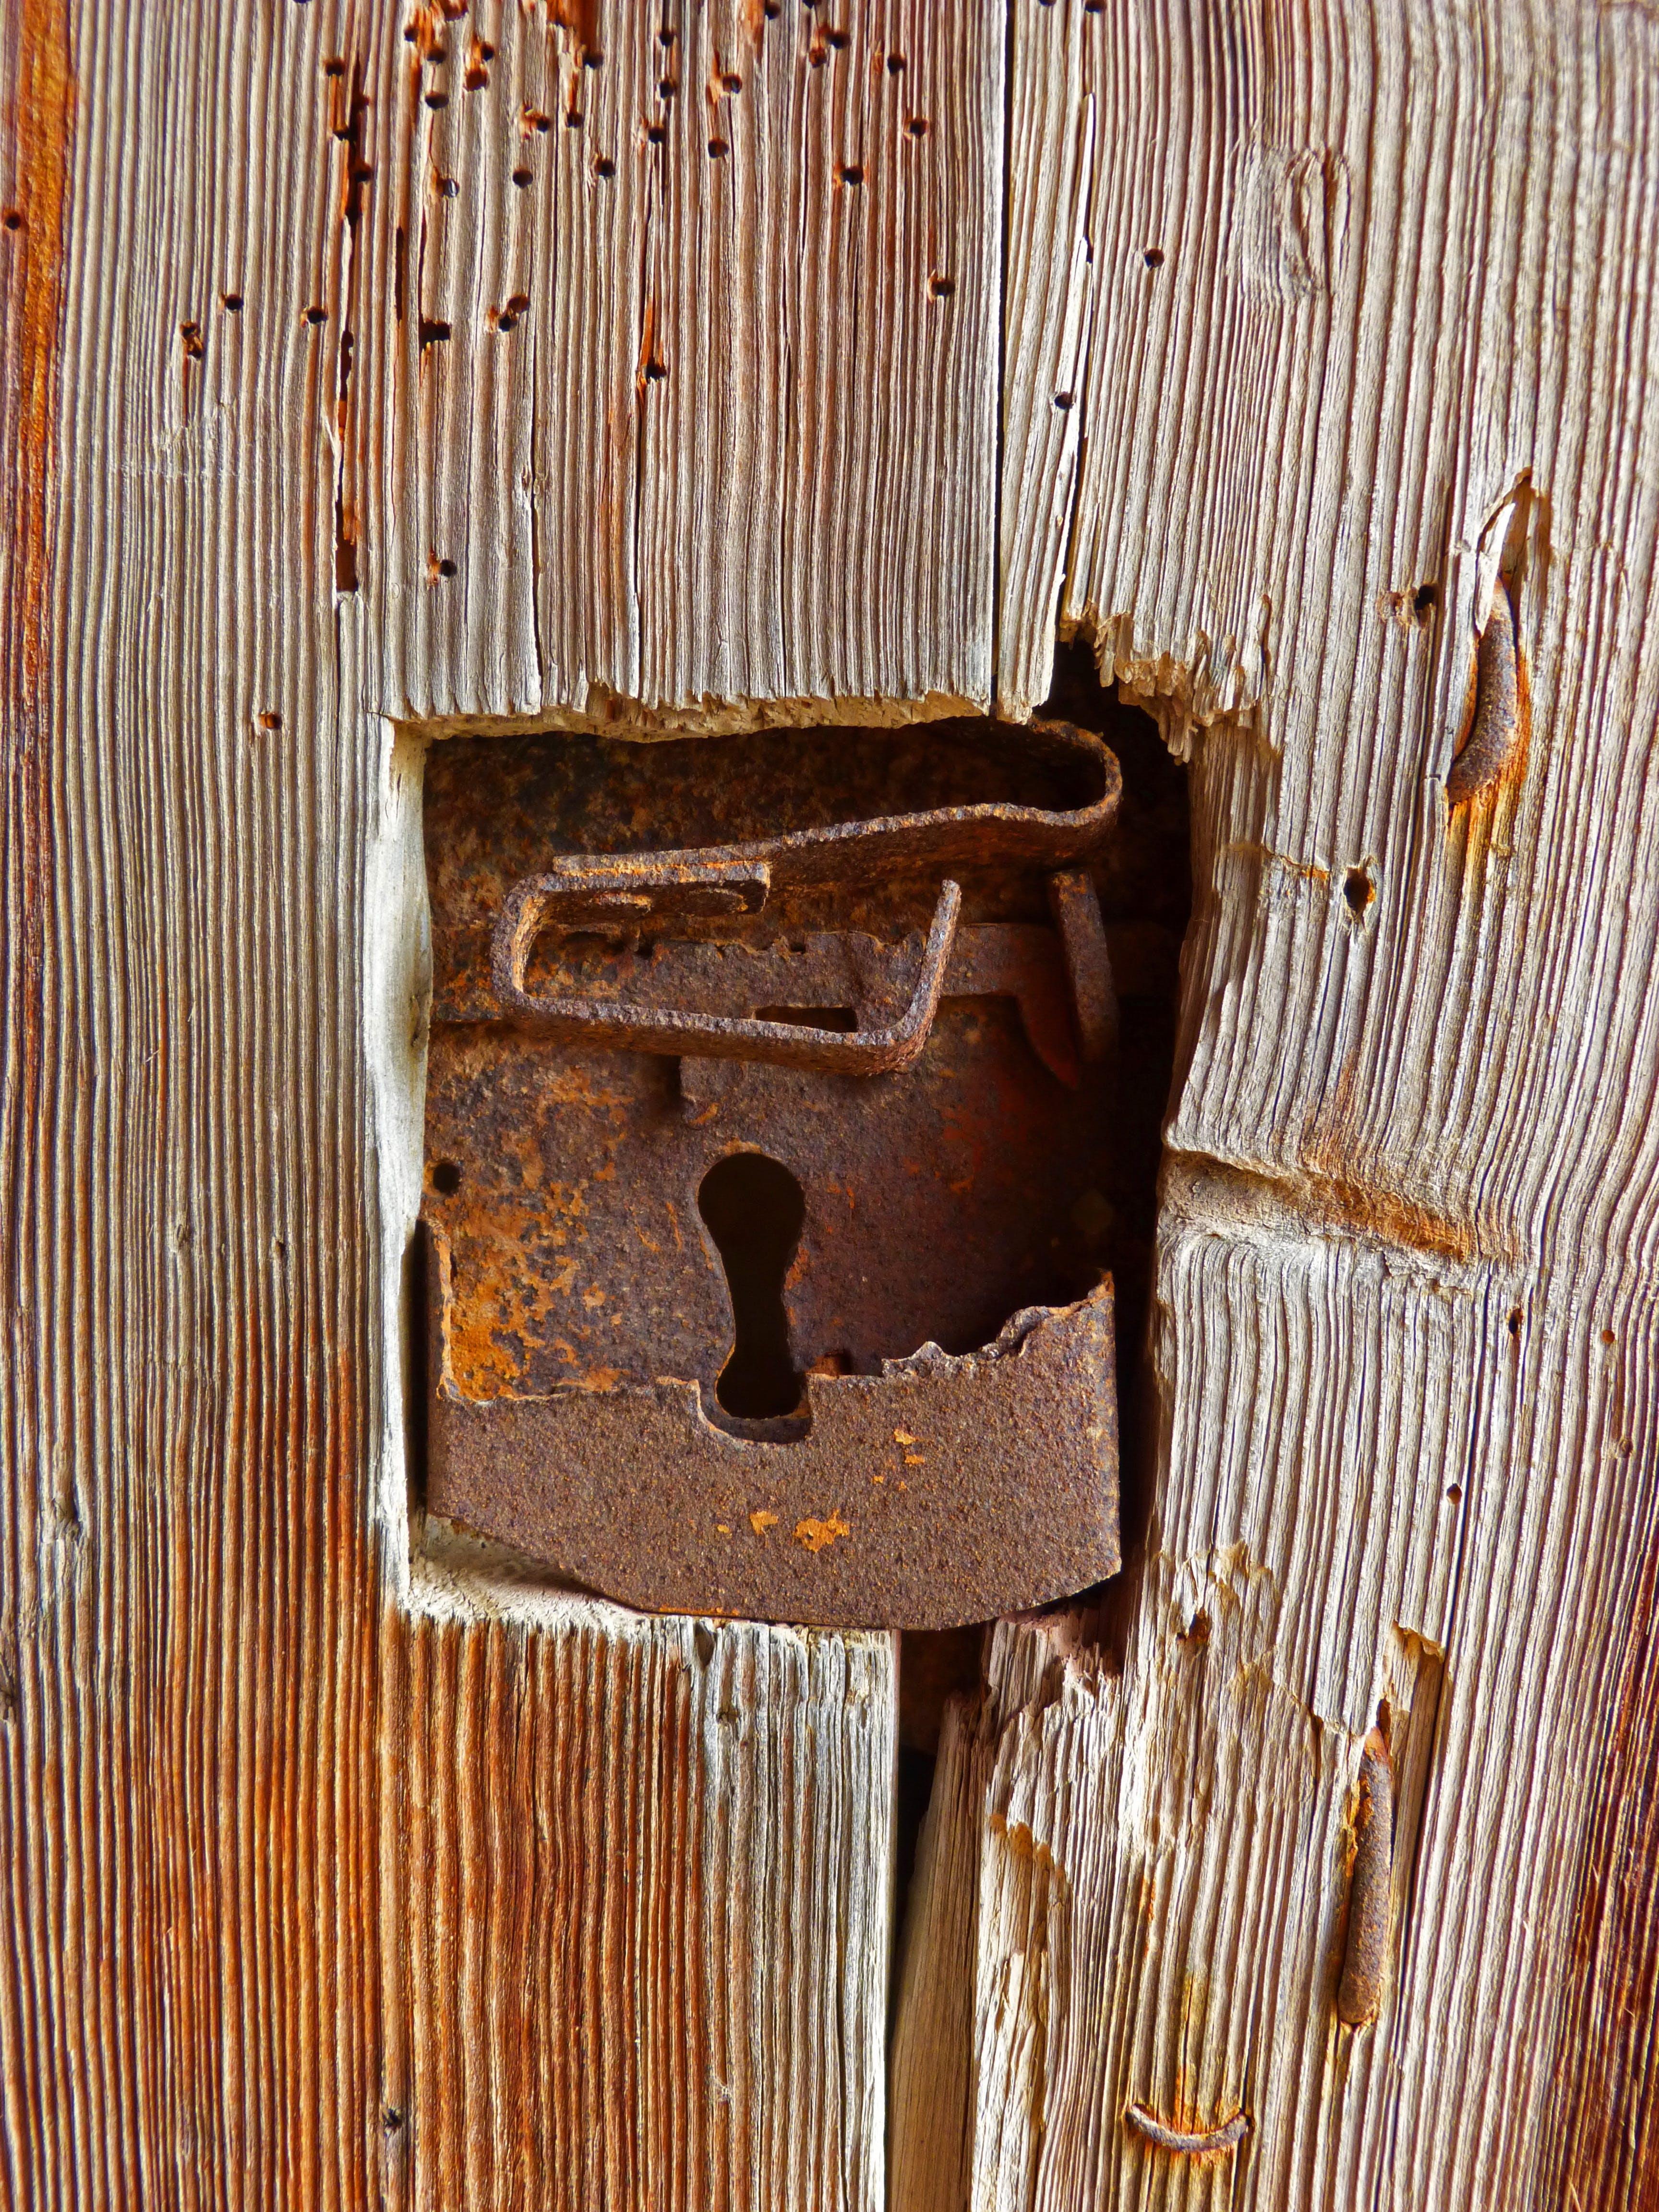 Brass Metal on Brown Wood